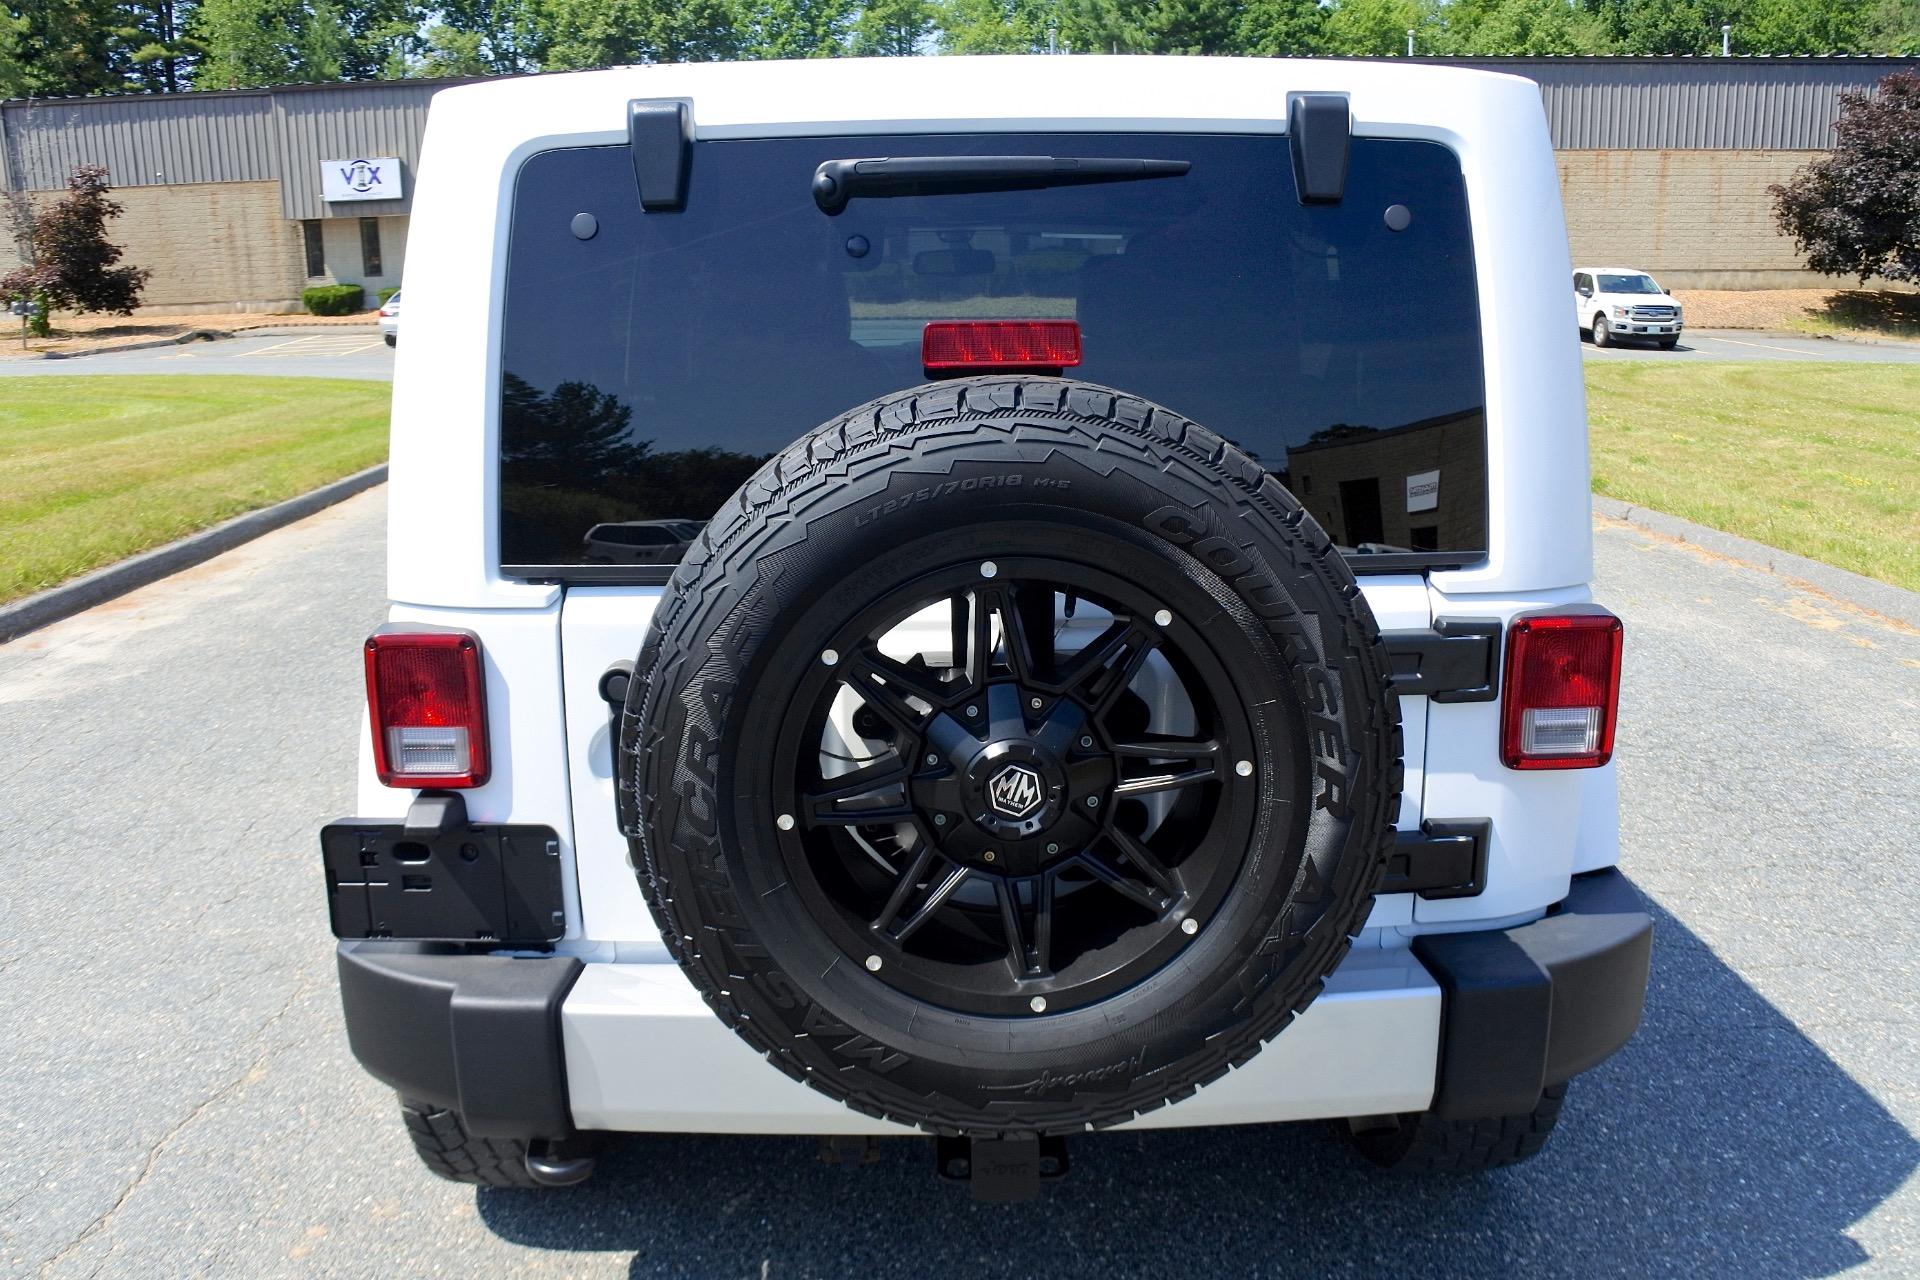 Used 2015 Jeep Wrangler Unlimited 4WD 4dr Sahara Used 2015 Jeep Wrangler Unlimited 4WD 4dr Sahara for sale  at Metro West Motorcars LLC in Shrewsbury MA 4